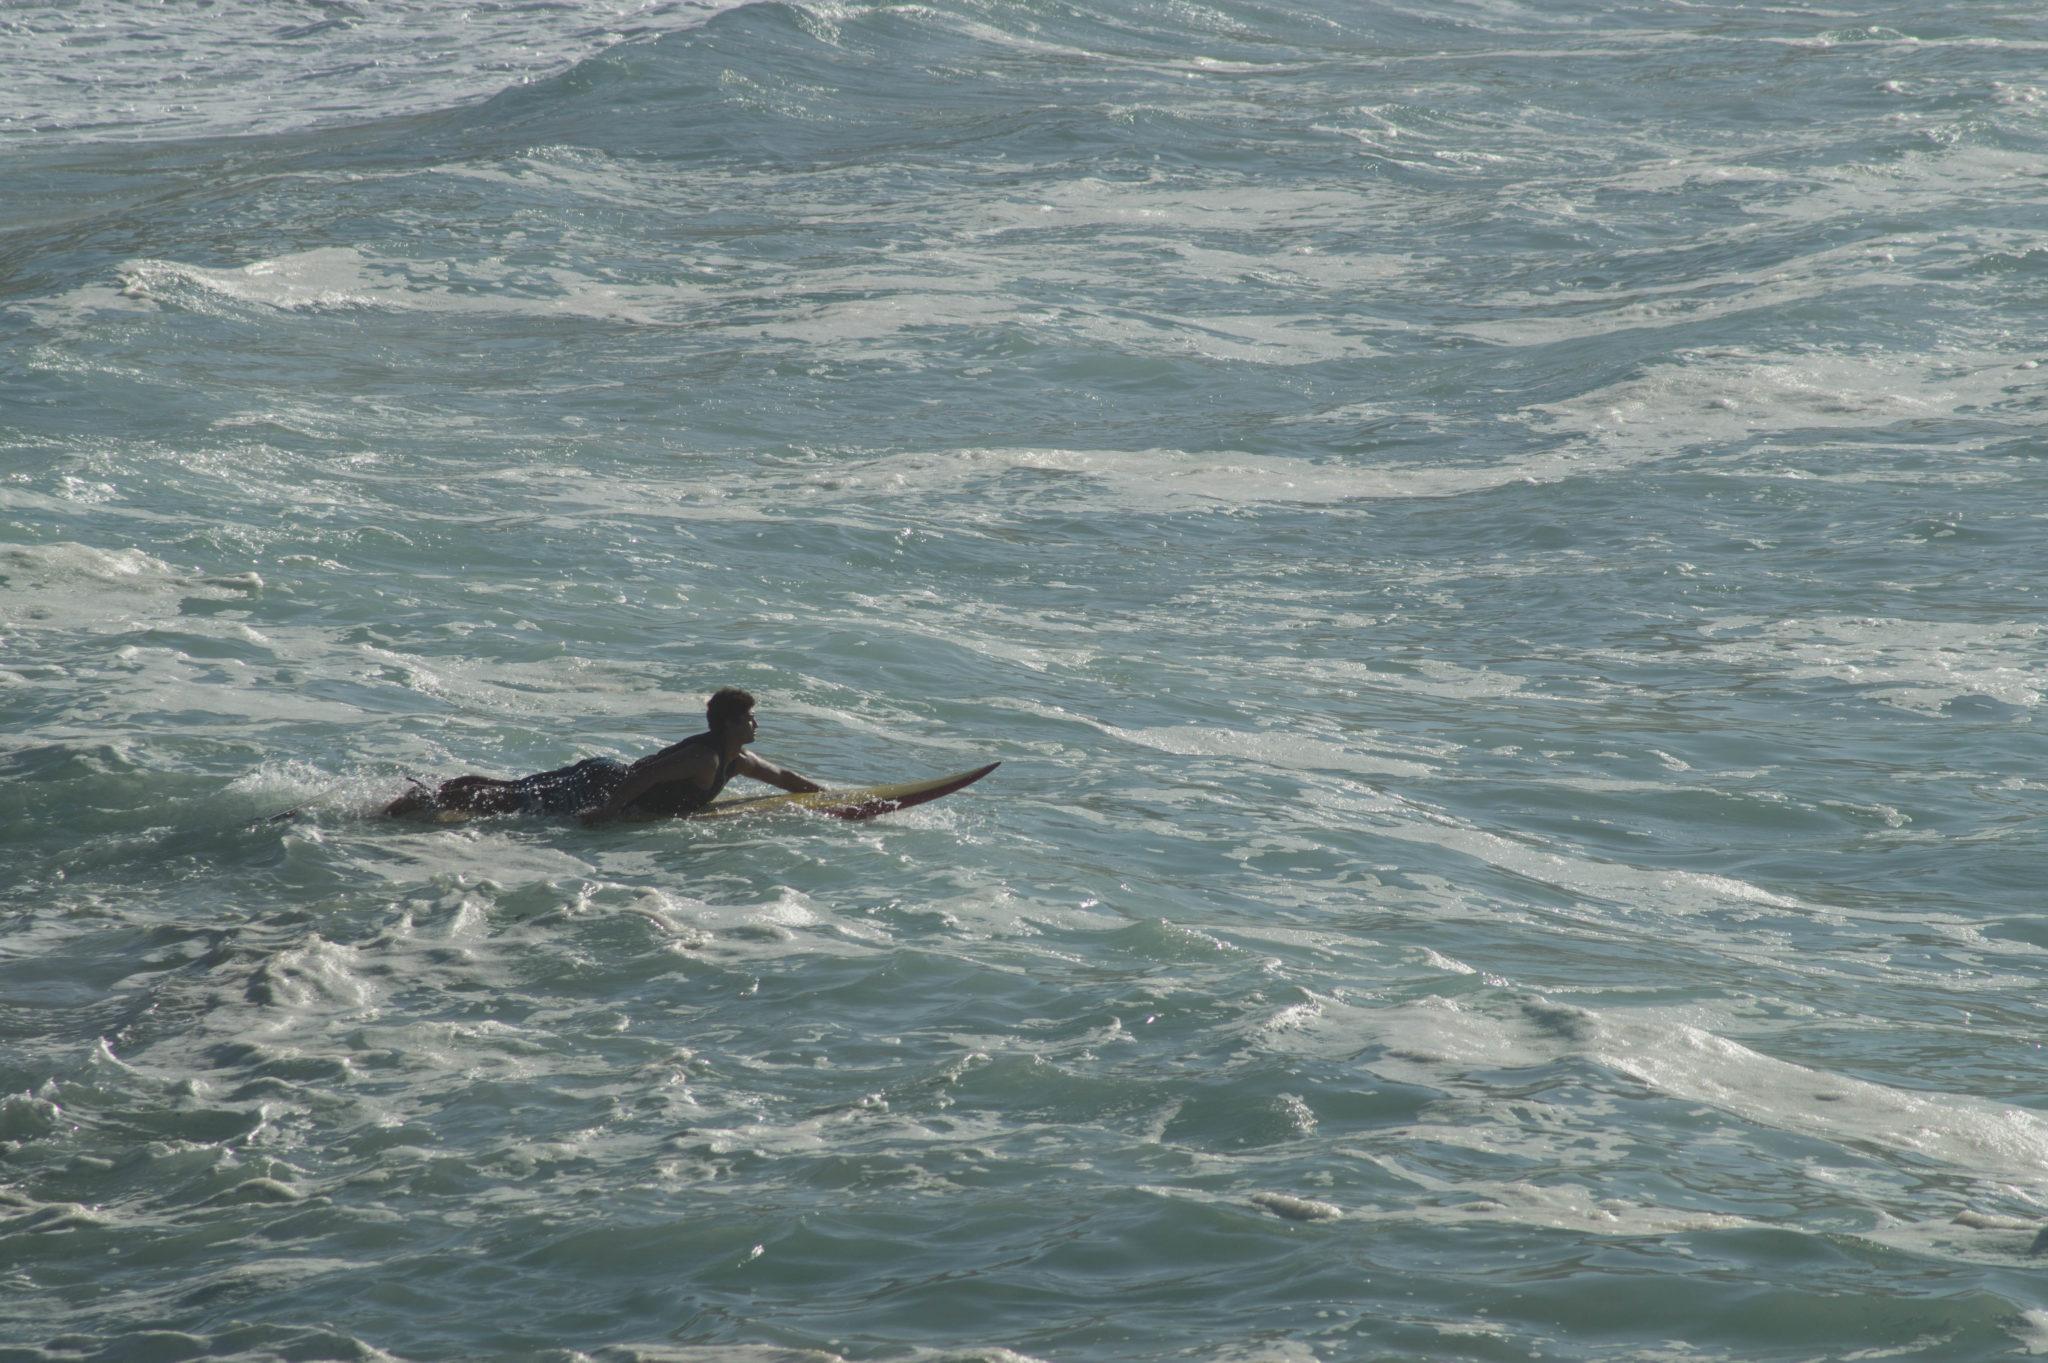 Surfen kann man auf Oahu Hawaii fast überall